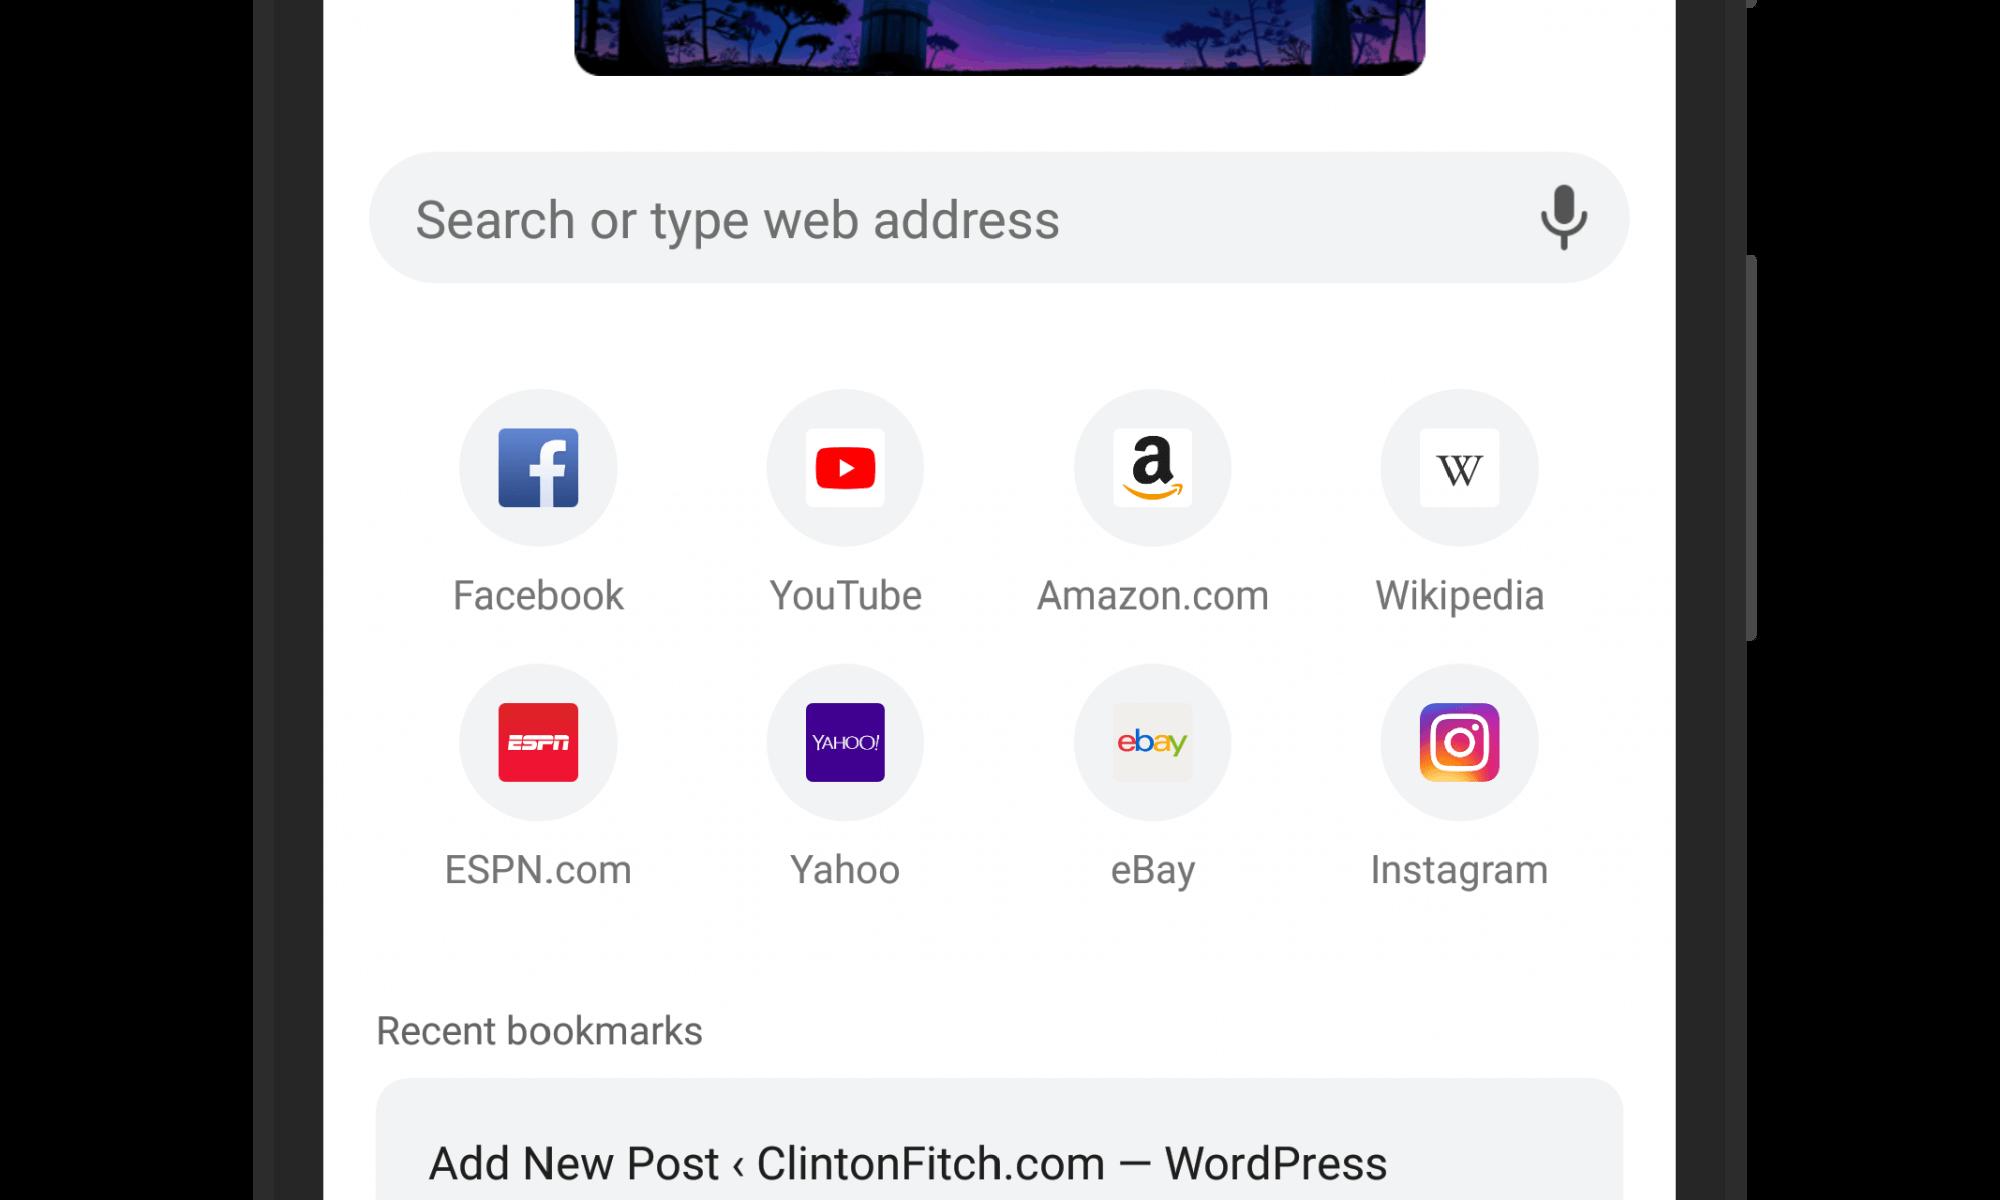 Chrome for Android Beta Modern UI